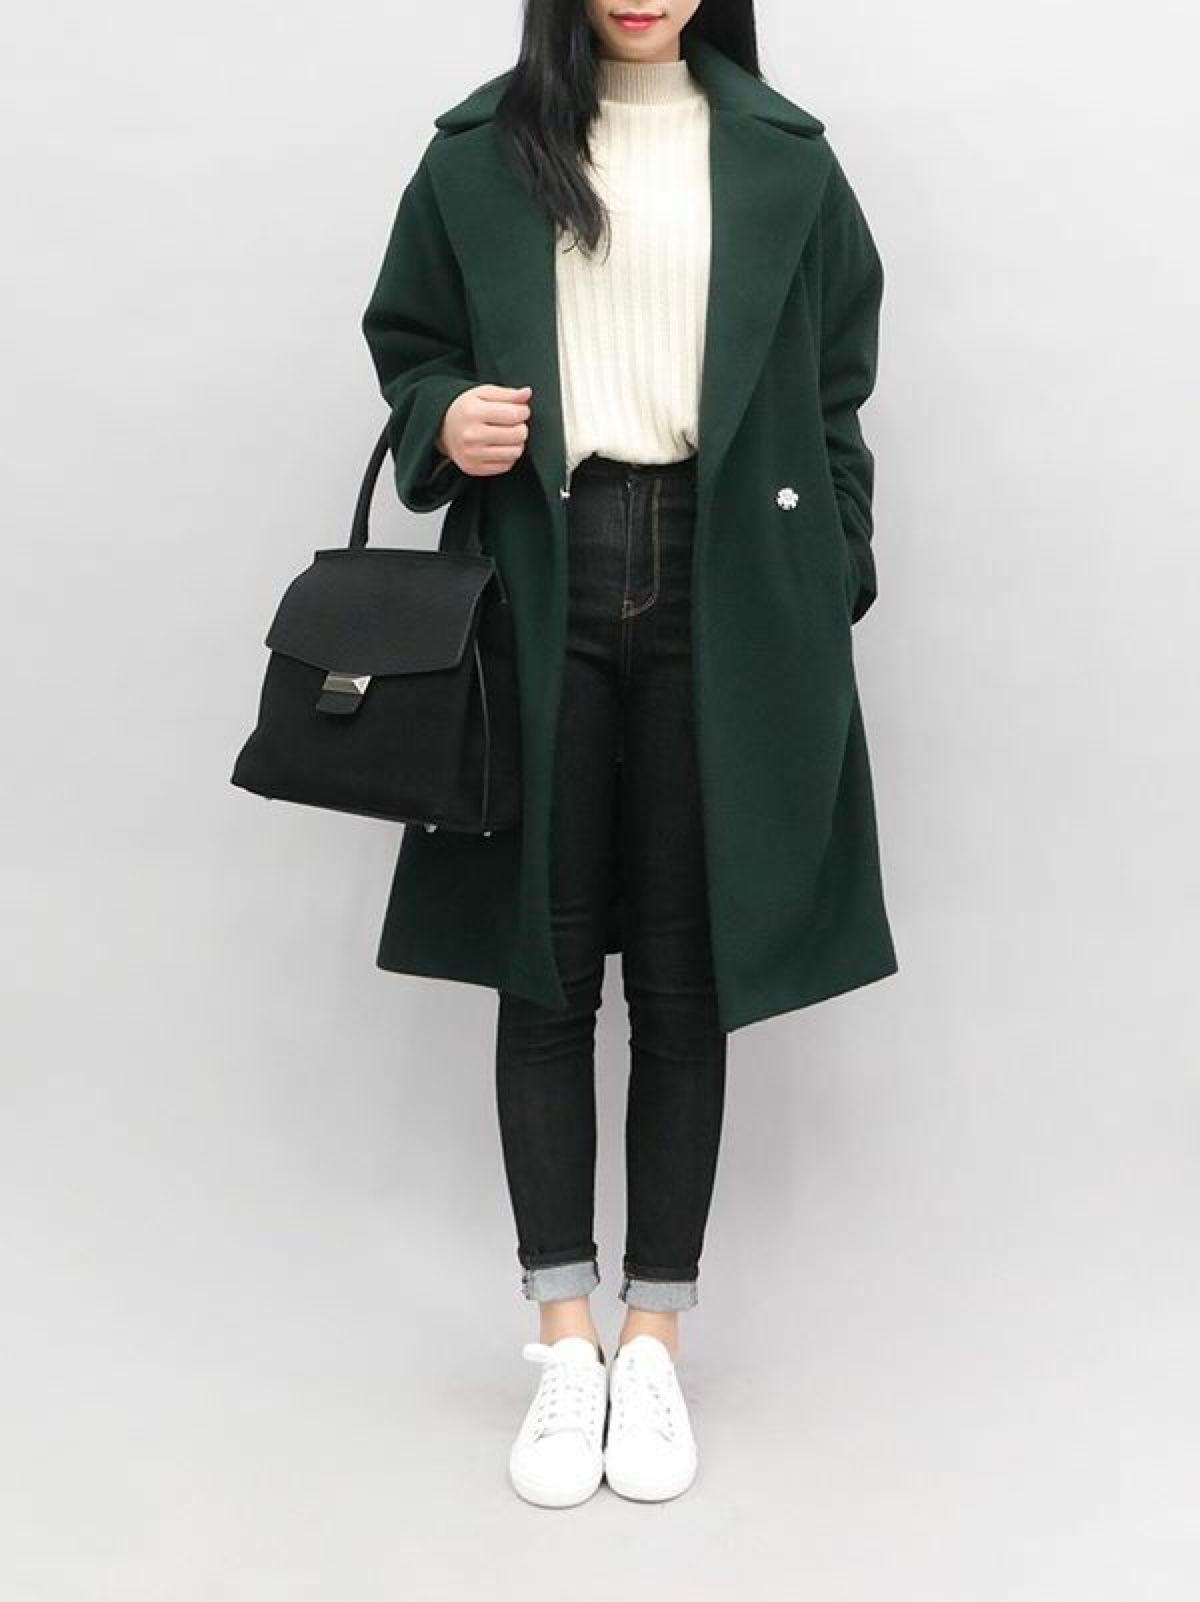 Bjy126 Marishe Reblog Foreverr Korea Fashion